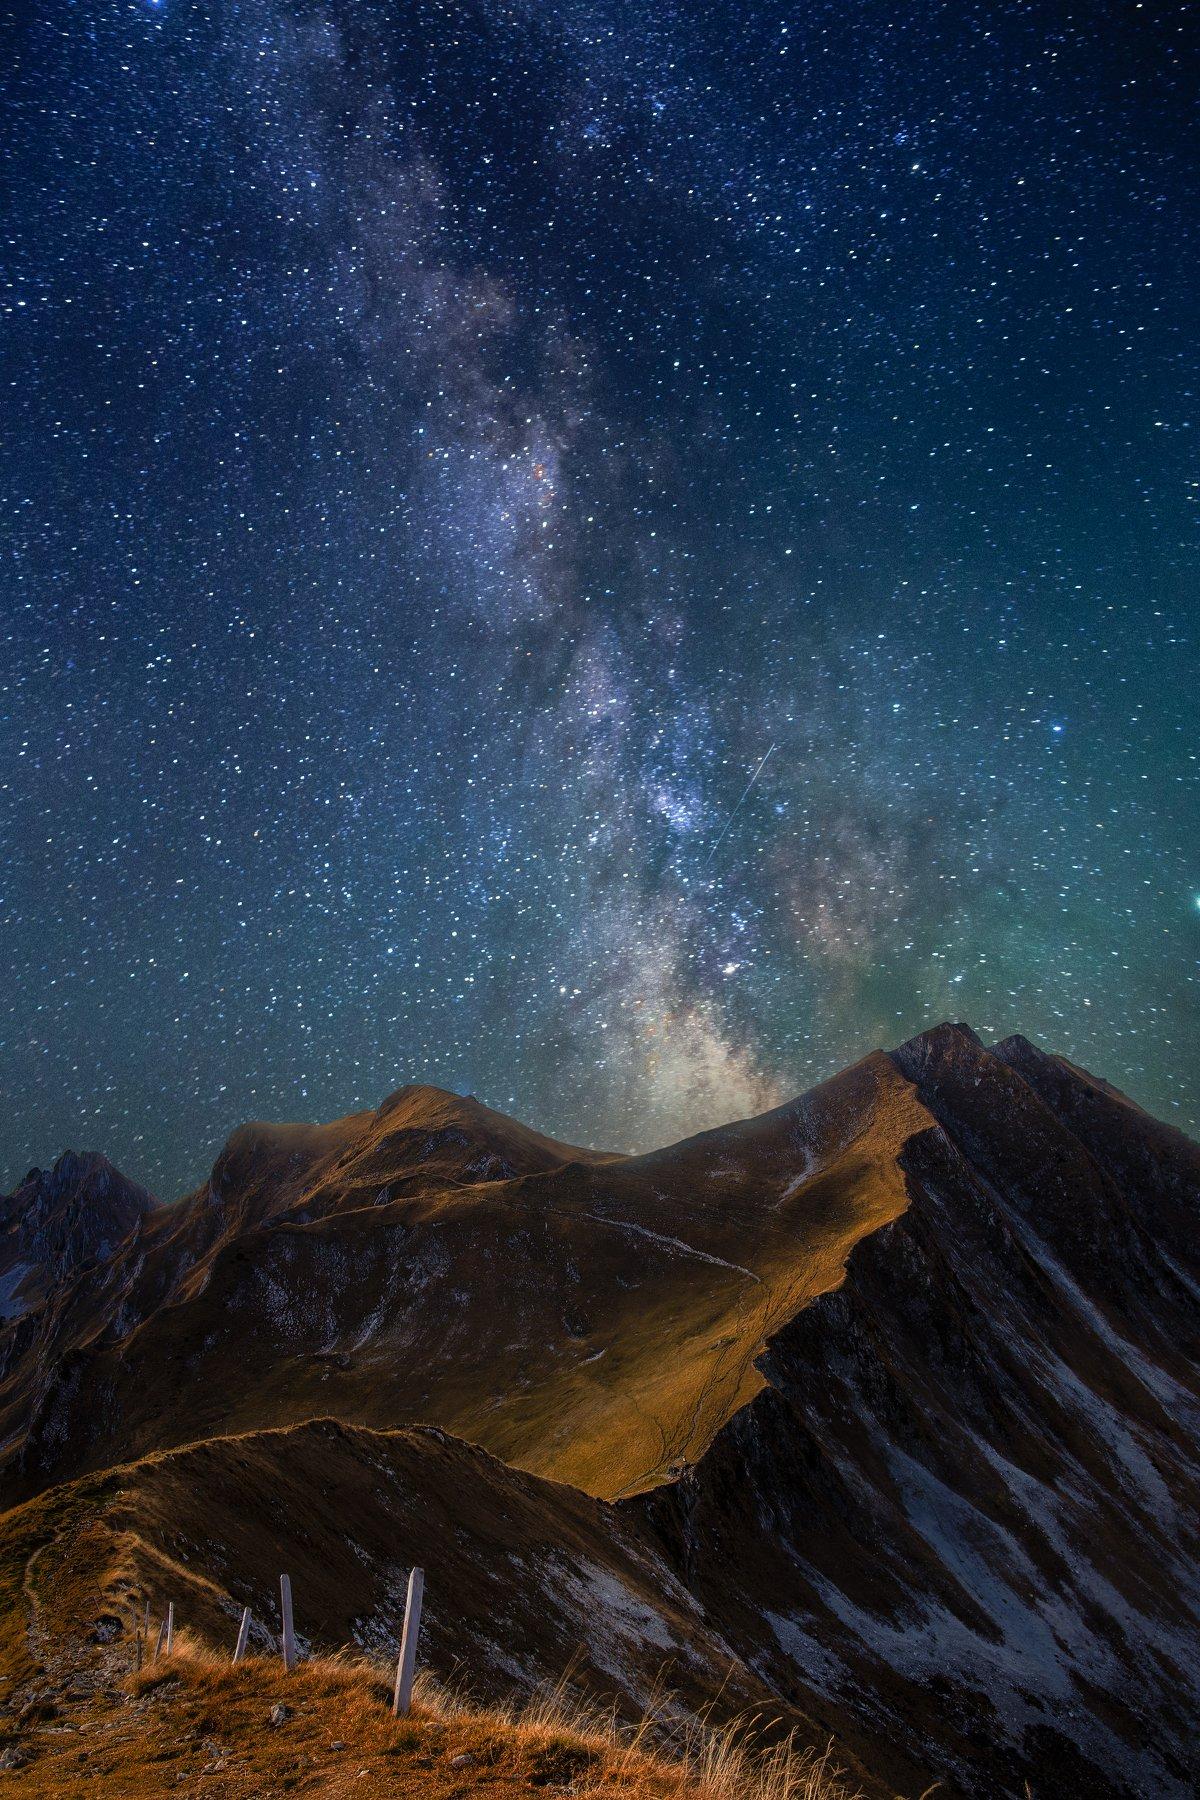 sky,stars,milky way,long exposure,landscape,travel,switzerland,mountains,, Felix Ostapenko